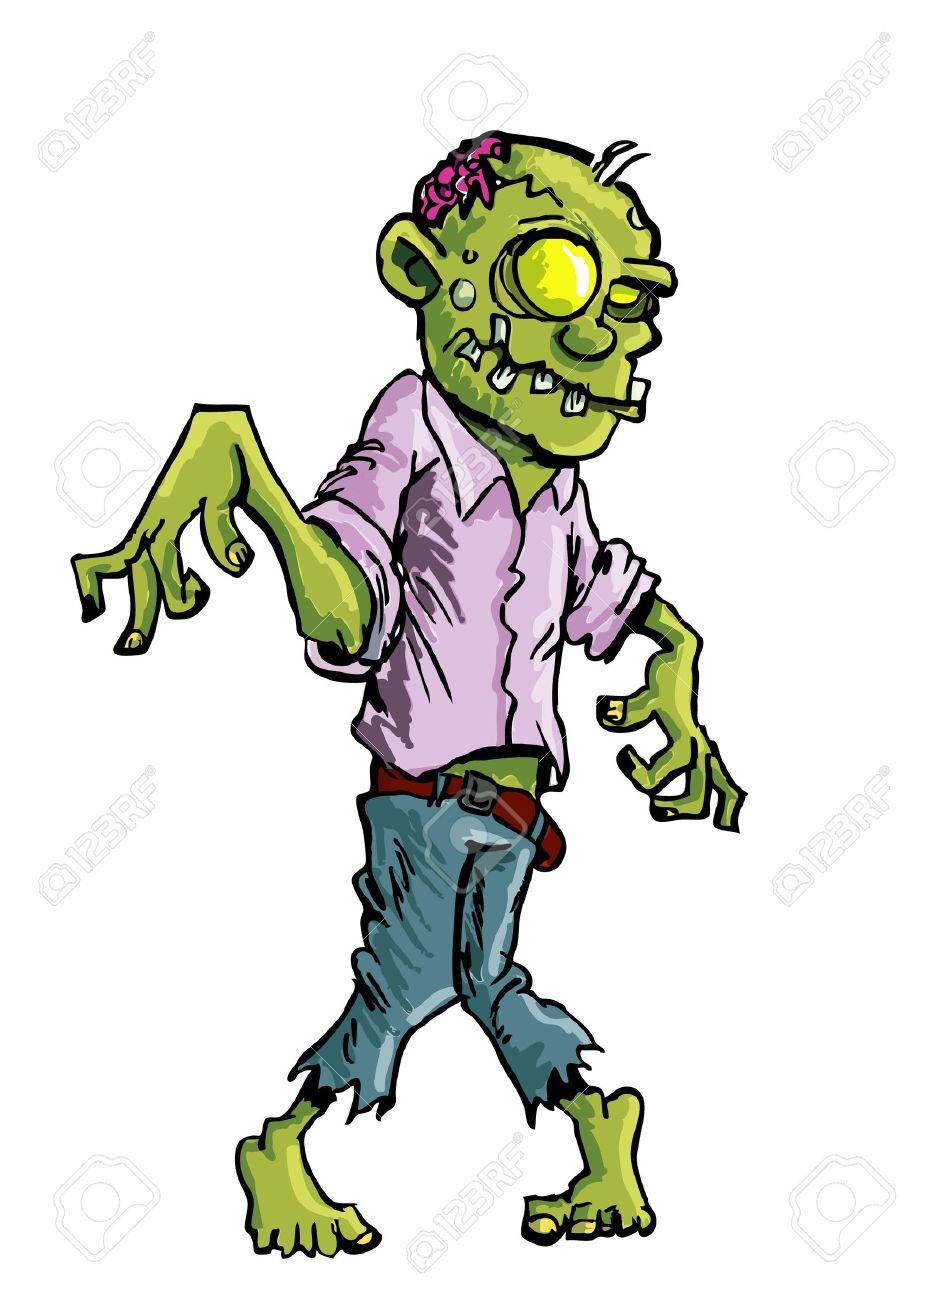 Image De Zombie Dessin